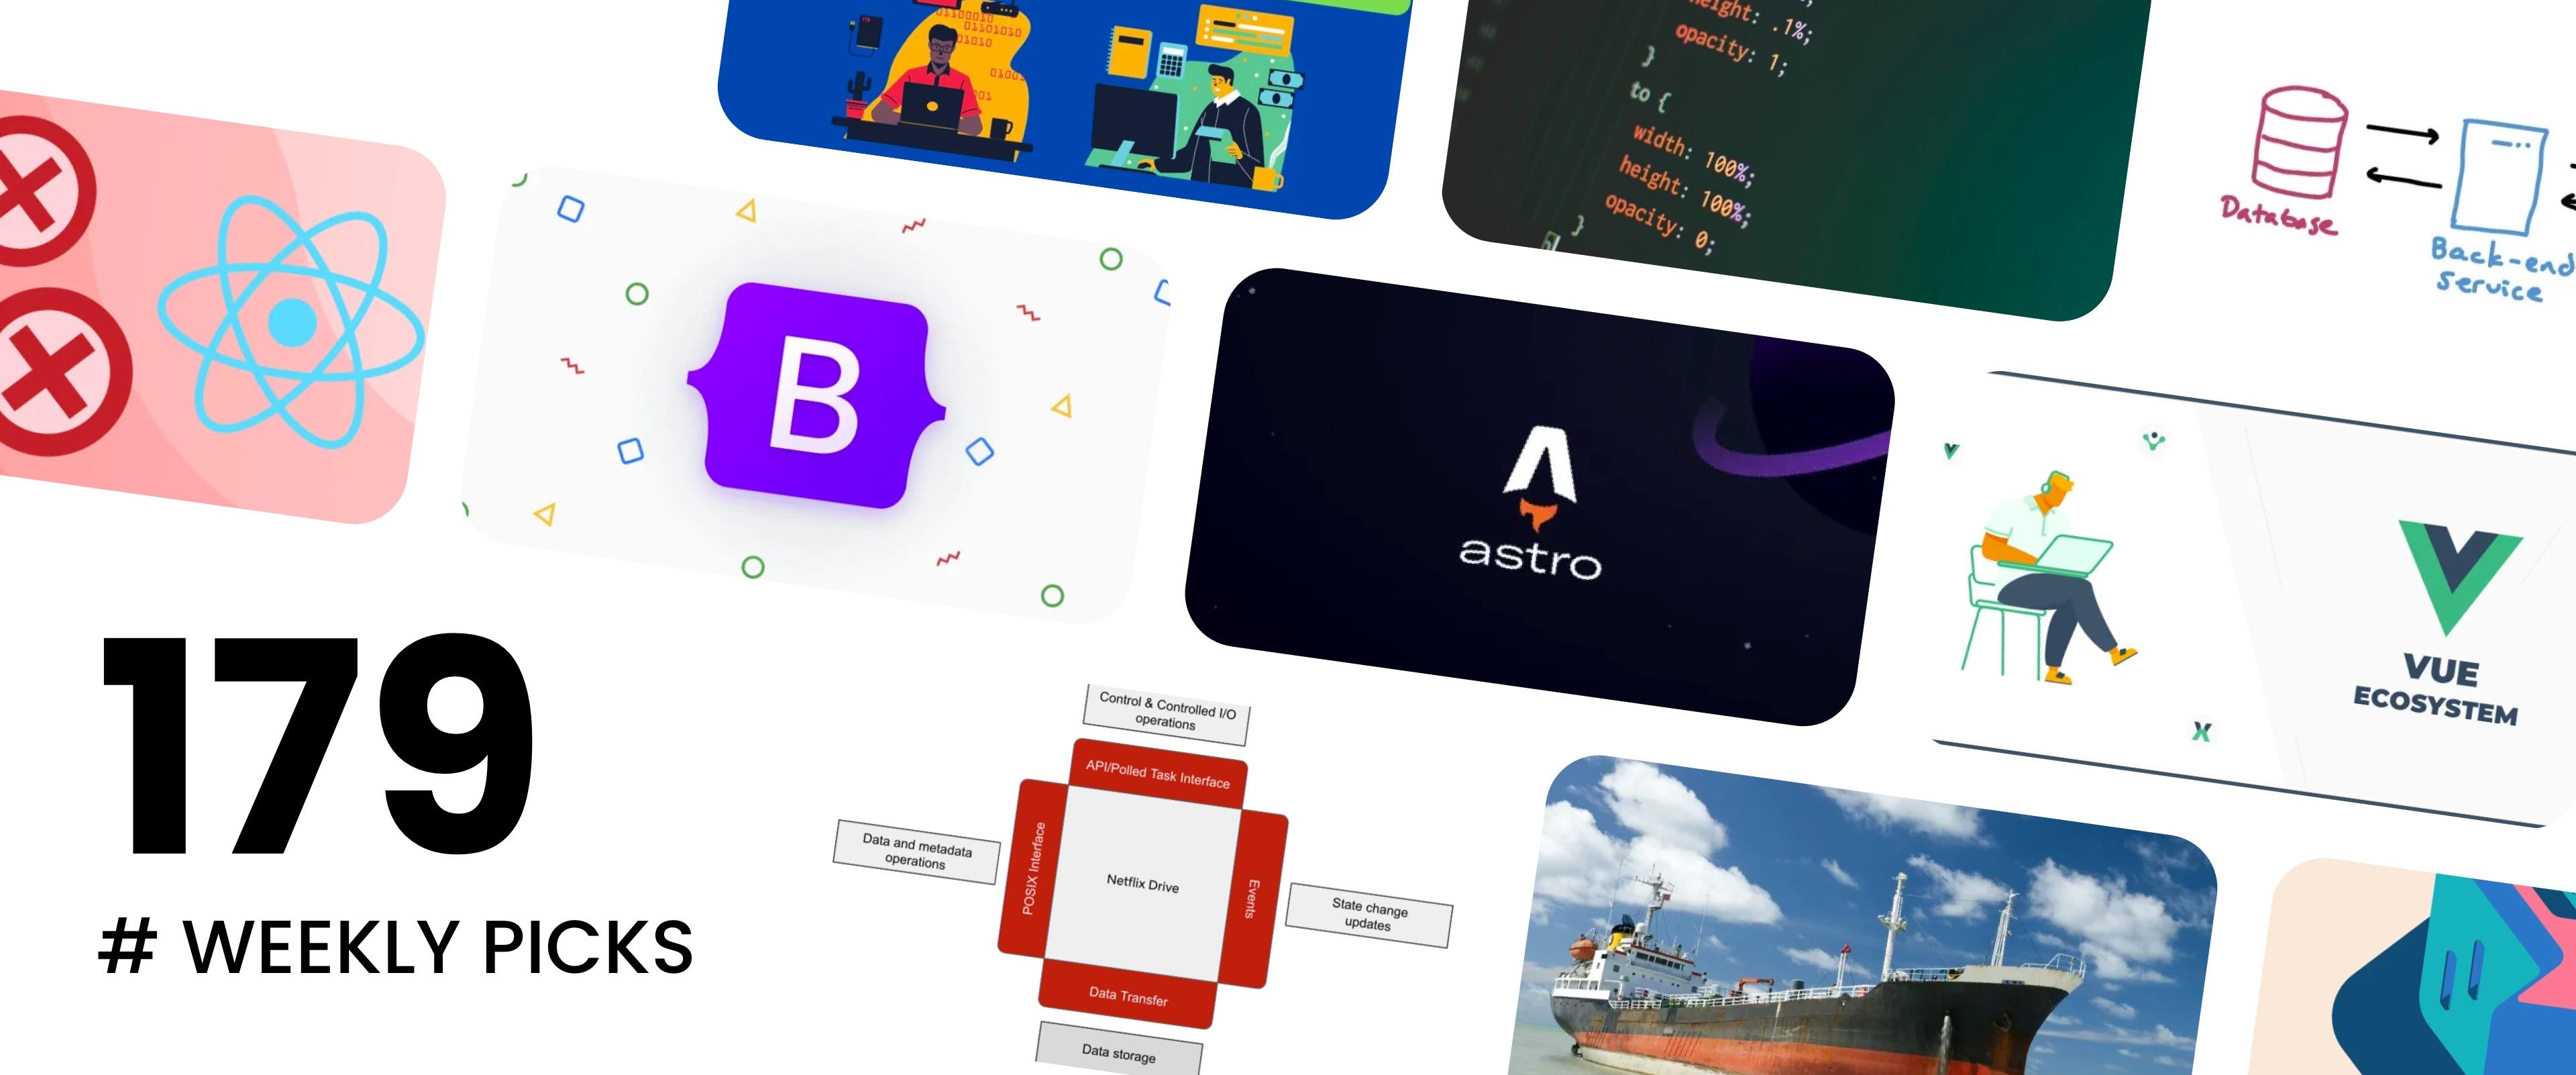 Making Money with Code, Bootstrap 5, Is Docker Dead - Picks #179